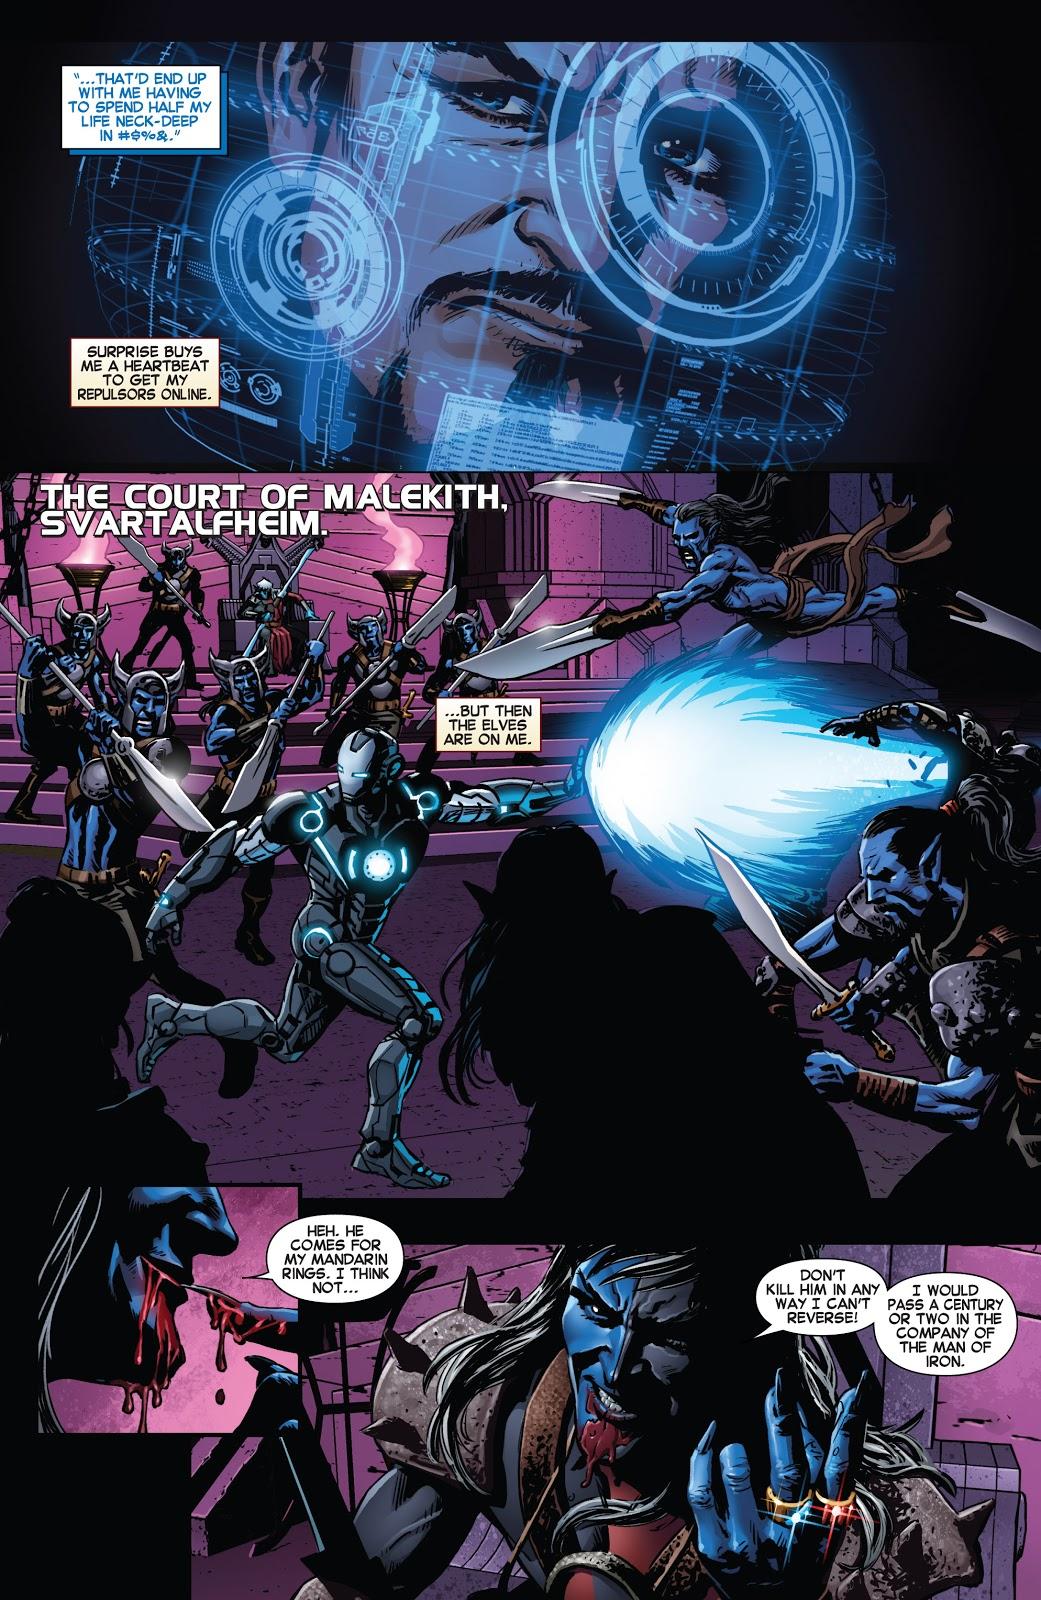 Iron Man Rings of the Mandarin review